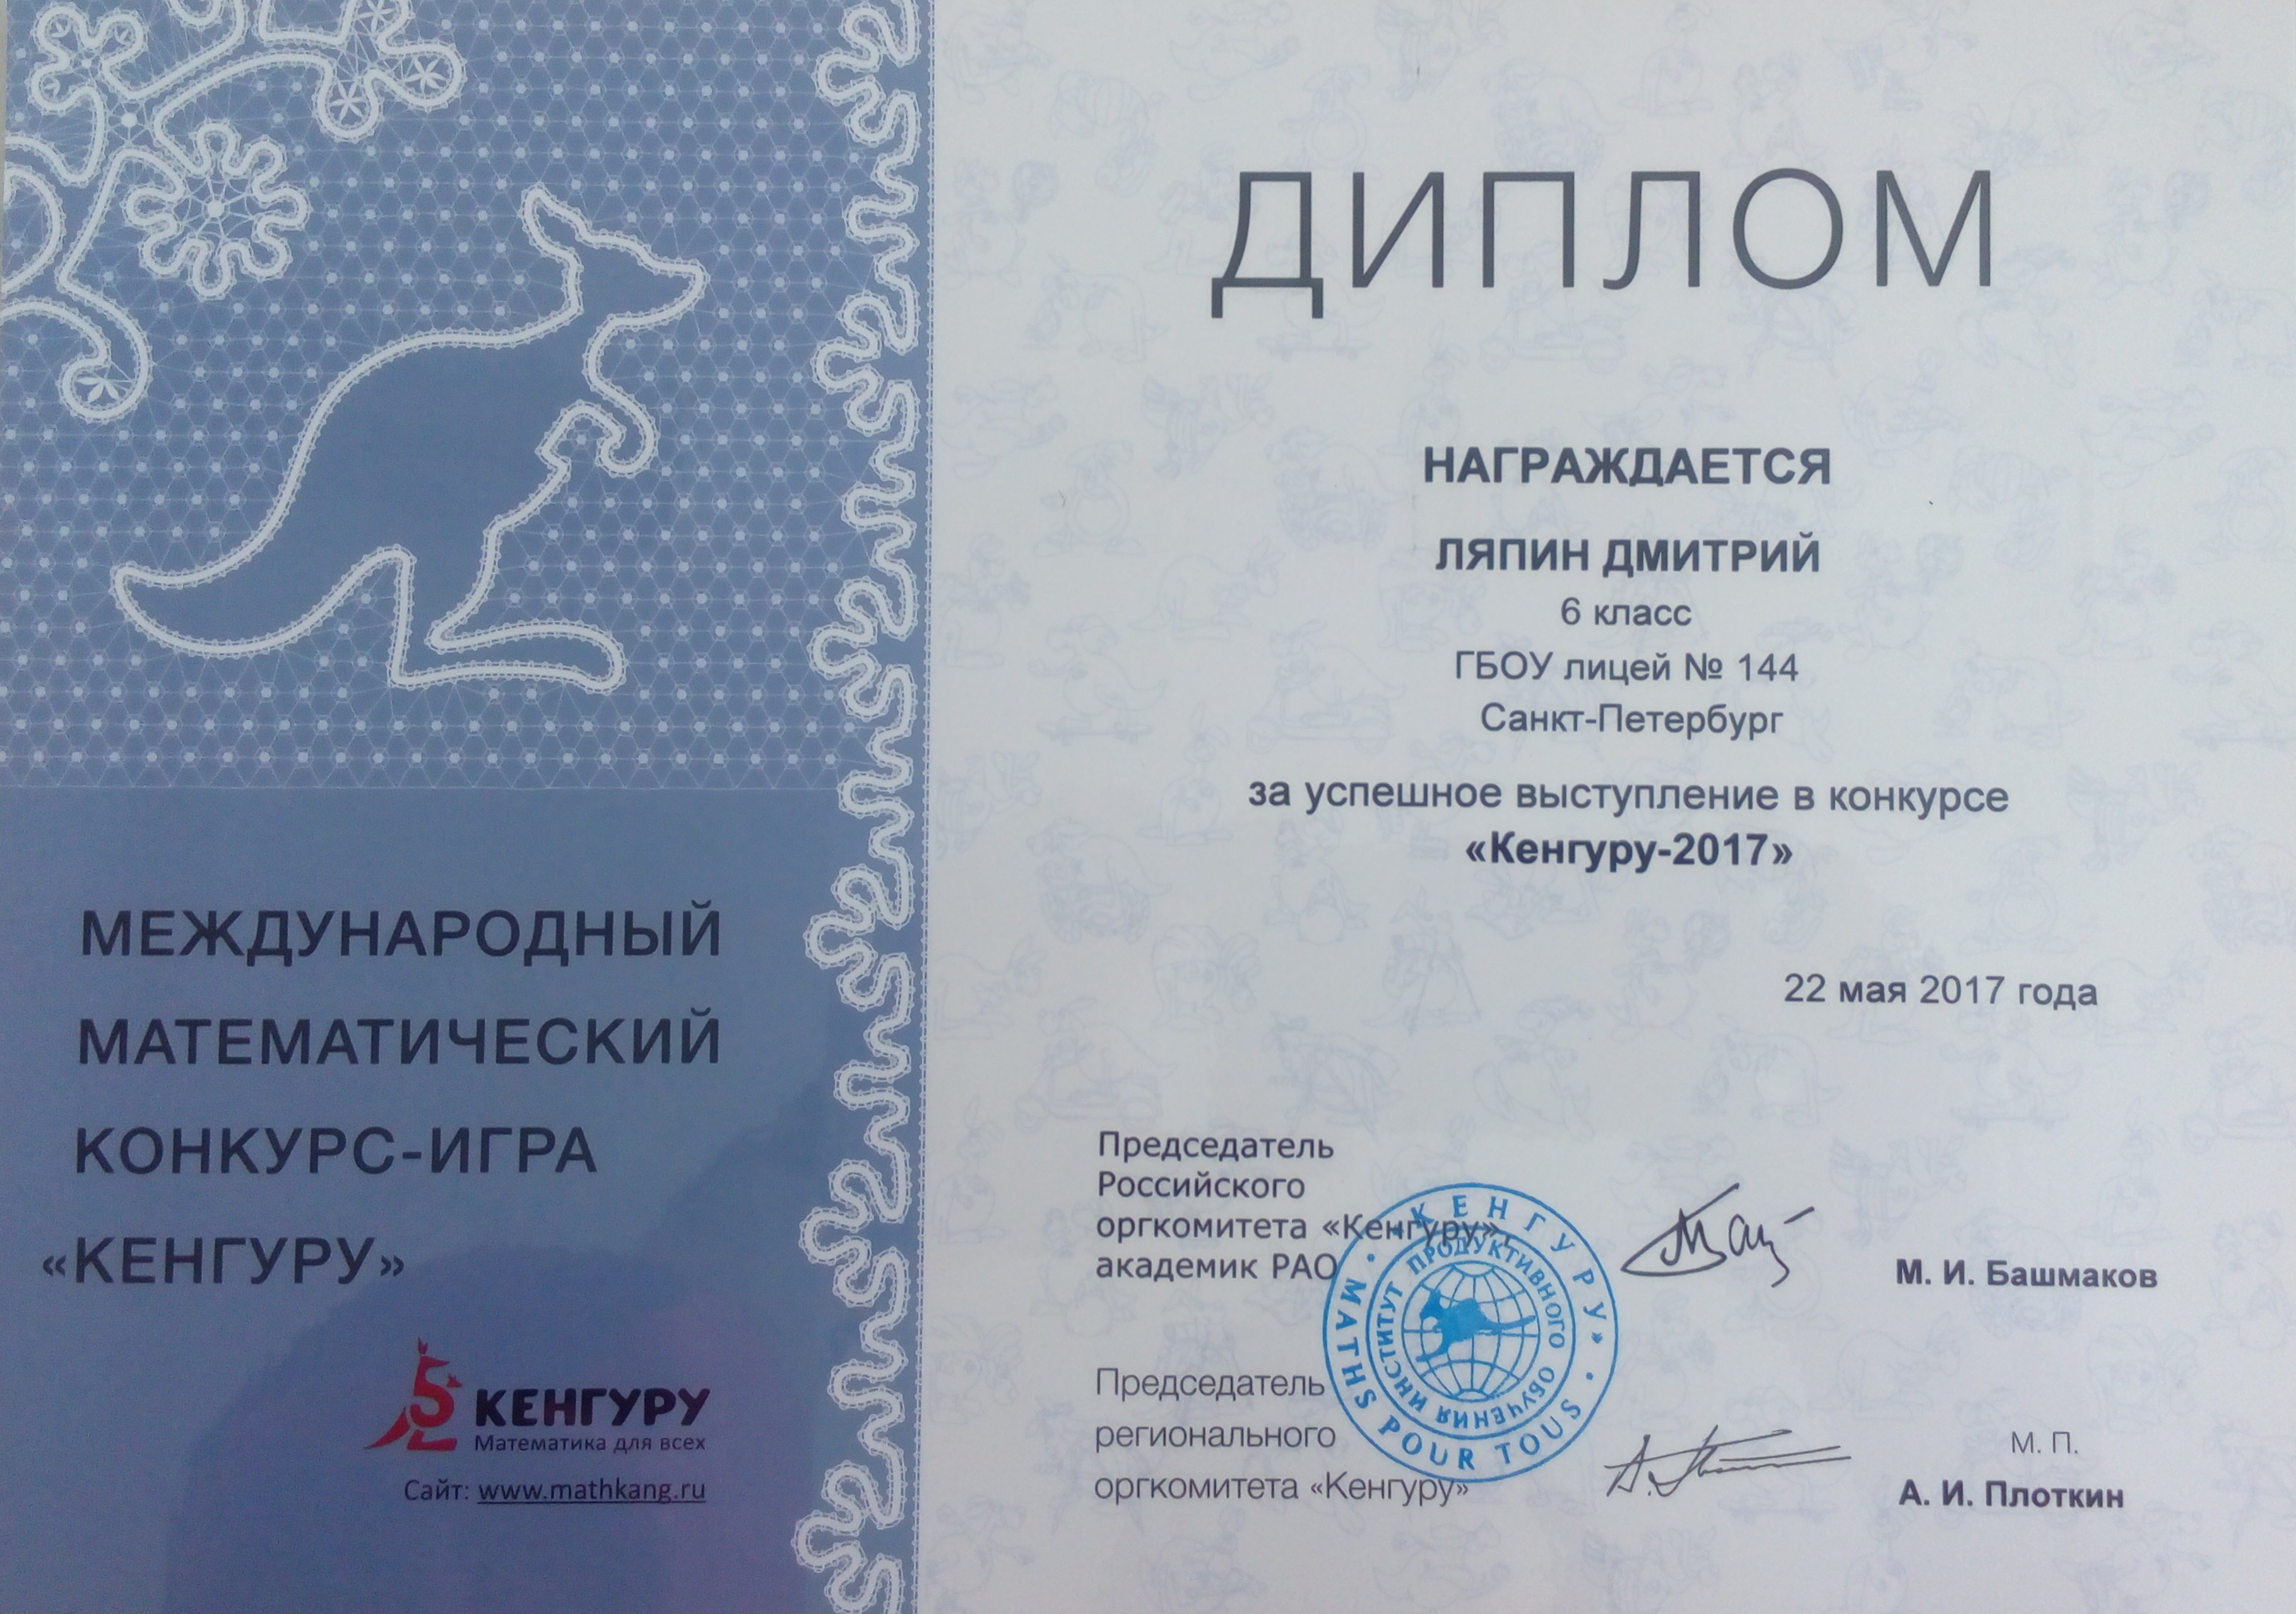 Международный конкурс кенгуру 3 4 классы 2017